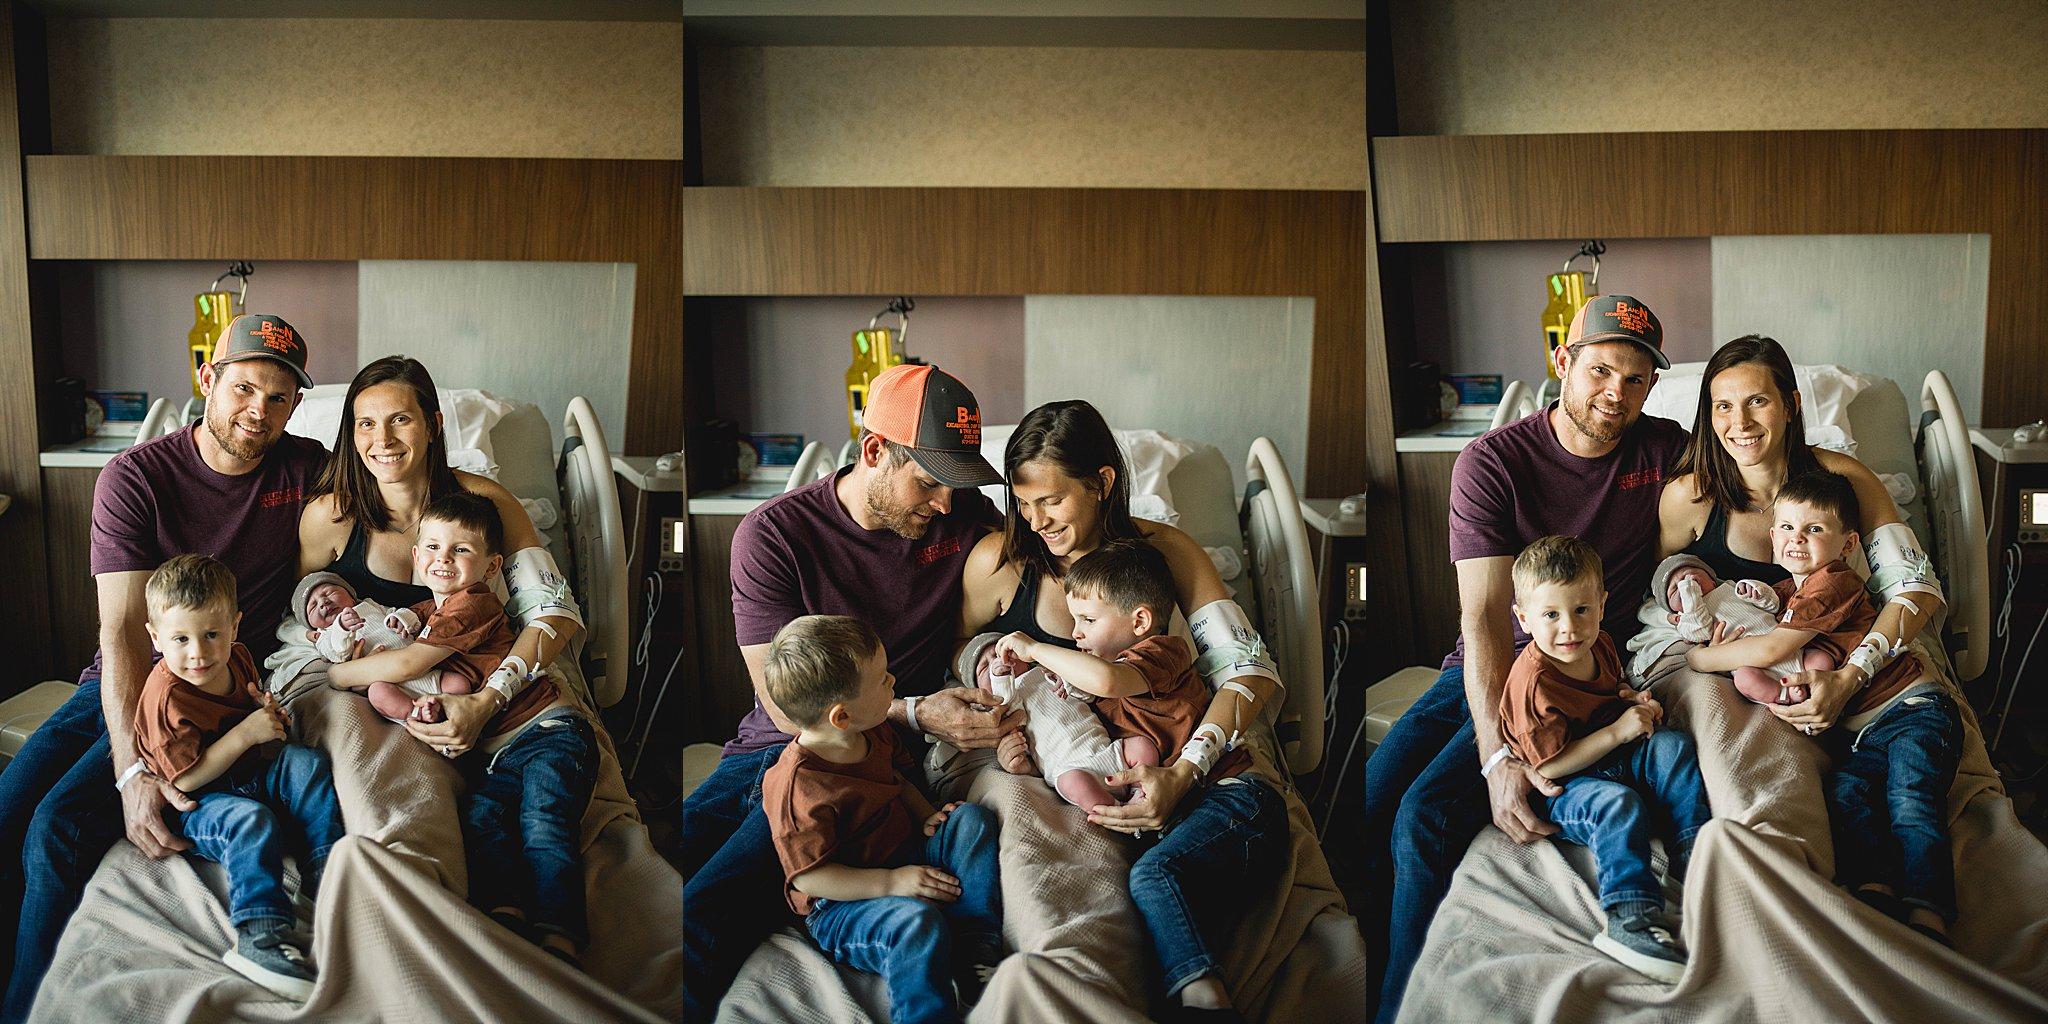 2019-03-16-hospital-baby-birth-photo-osage-beach-missouri-lake-12.jpg